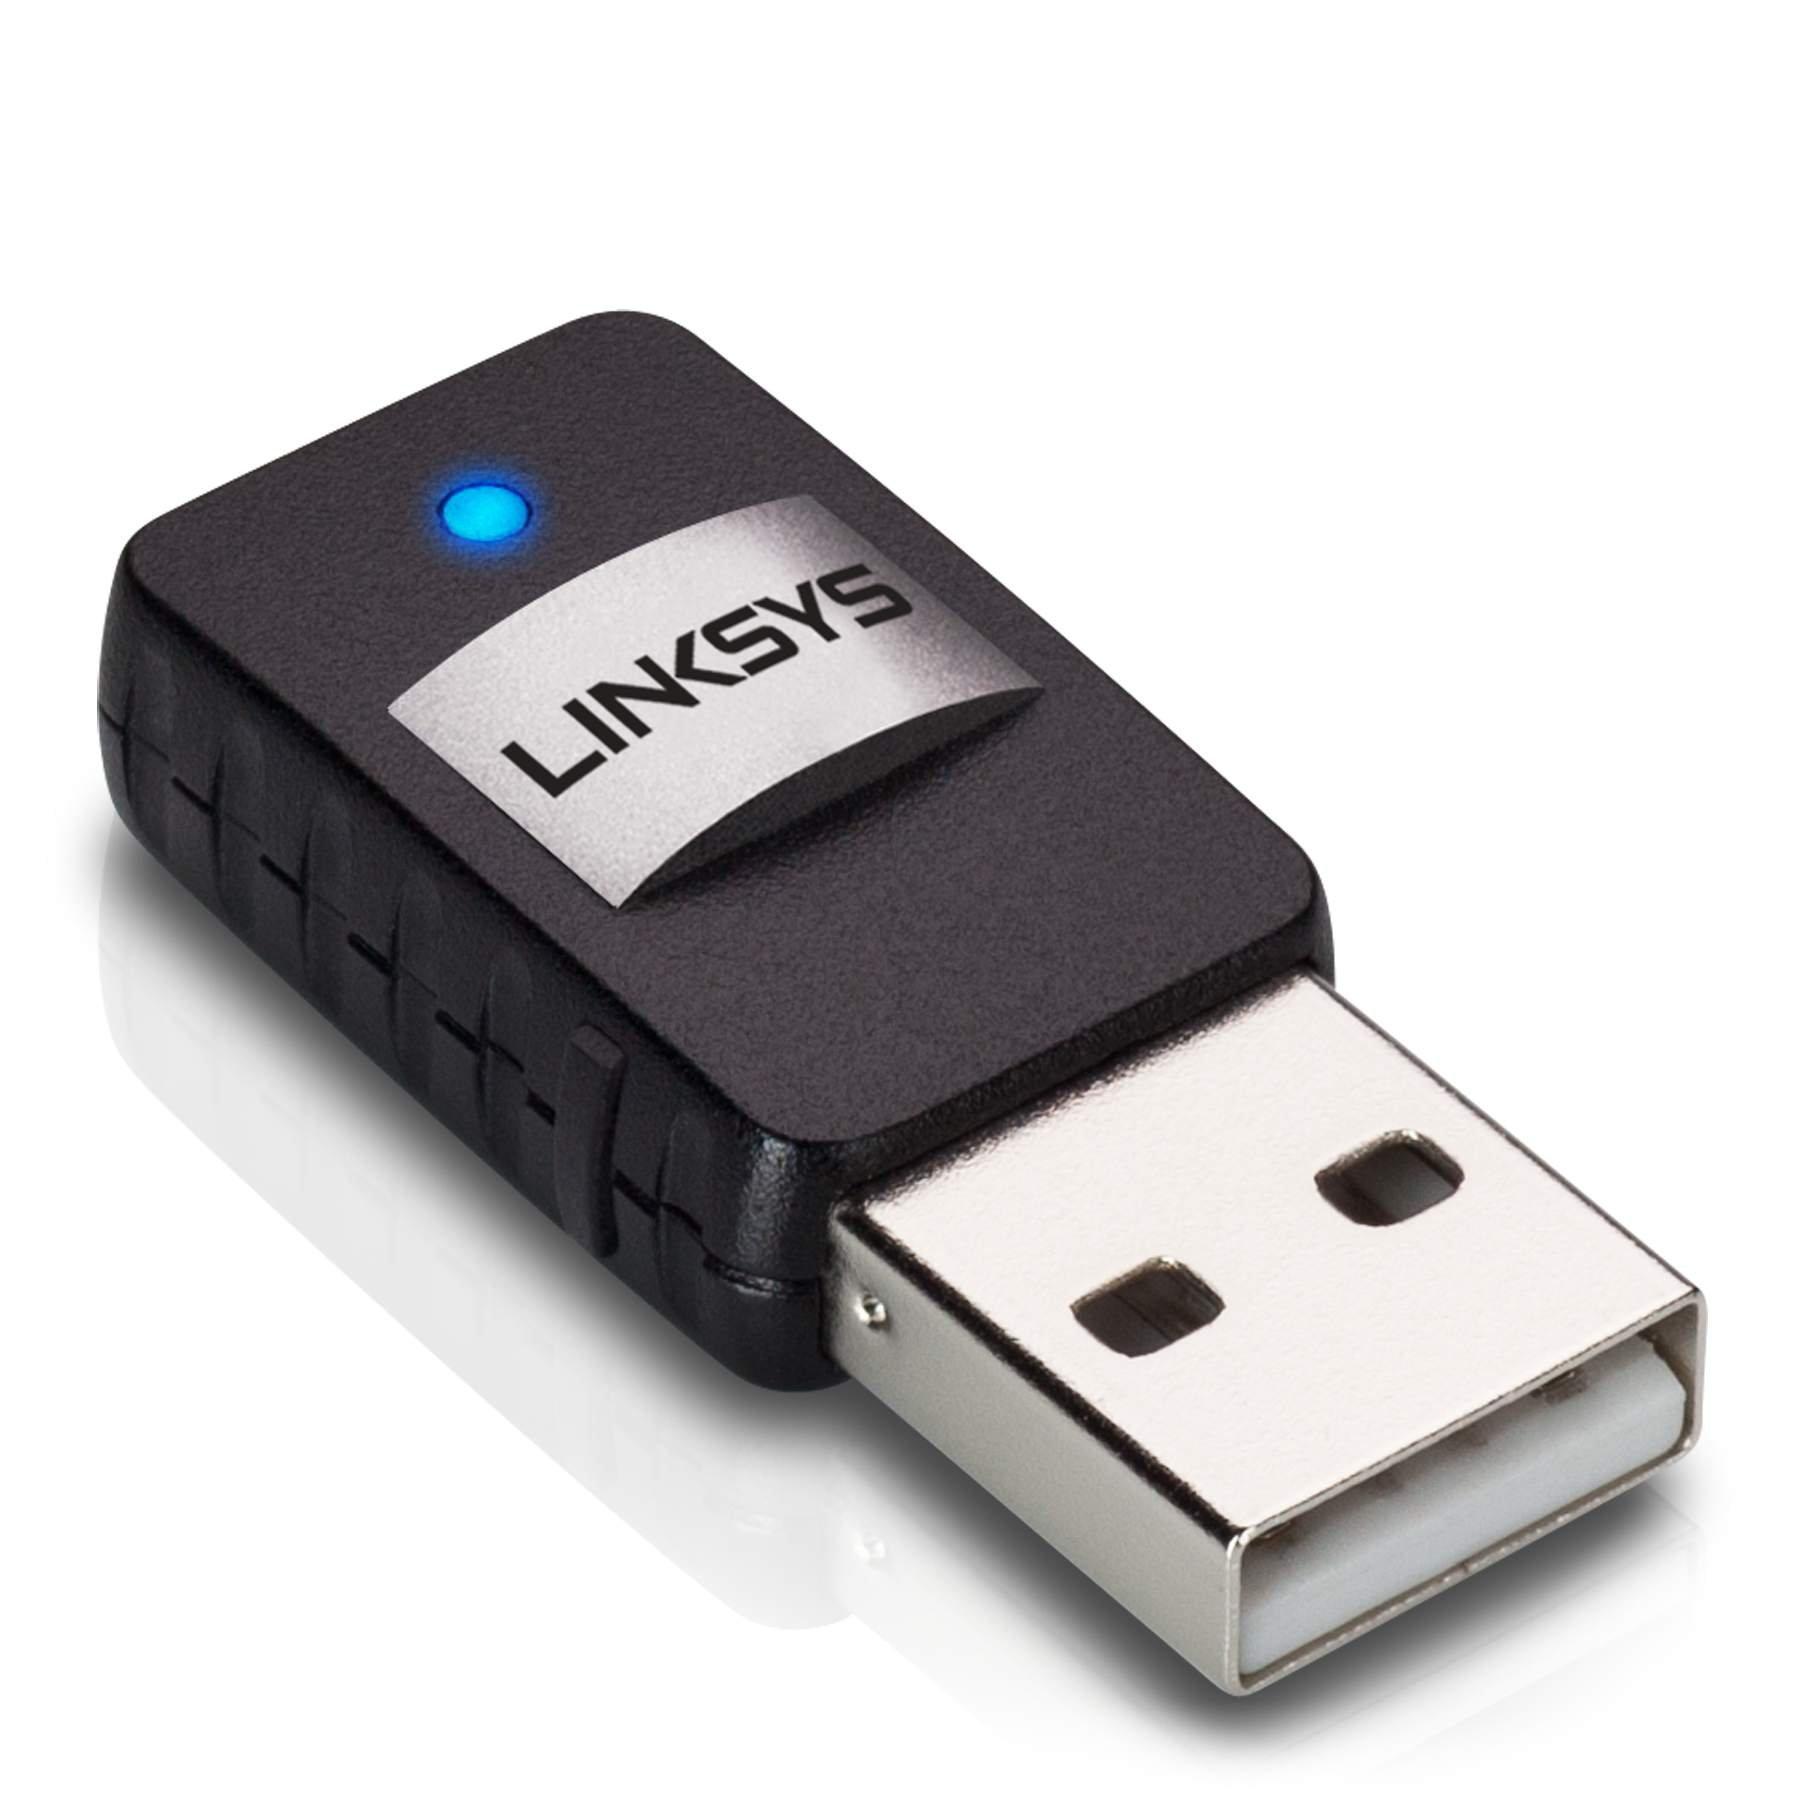 Linksys Wireless Mini USB Adapter AC 580 Dual Band (AE6000) by Linksys